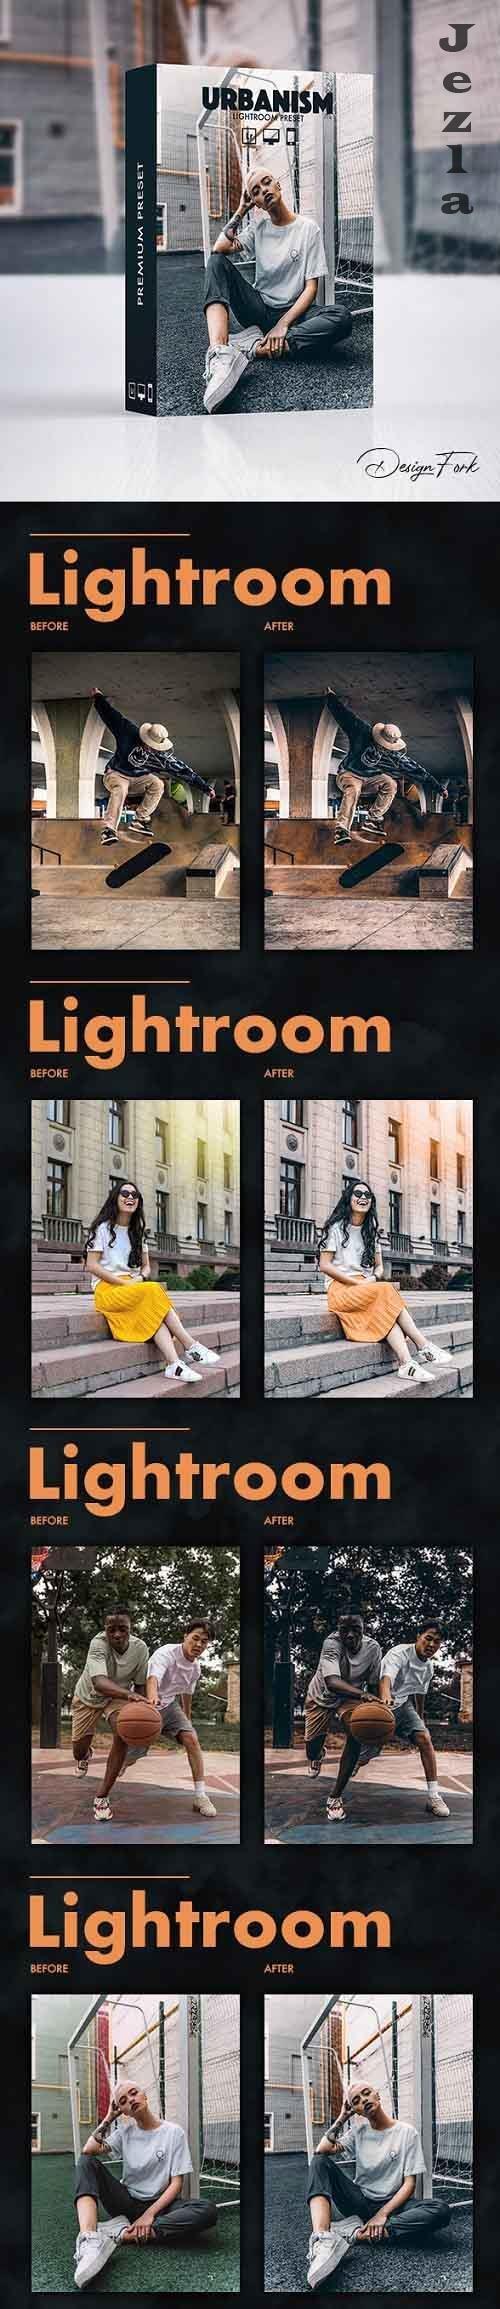 GraphicRiver - Urbanism FX Lightroom Preset 30141897